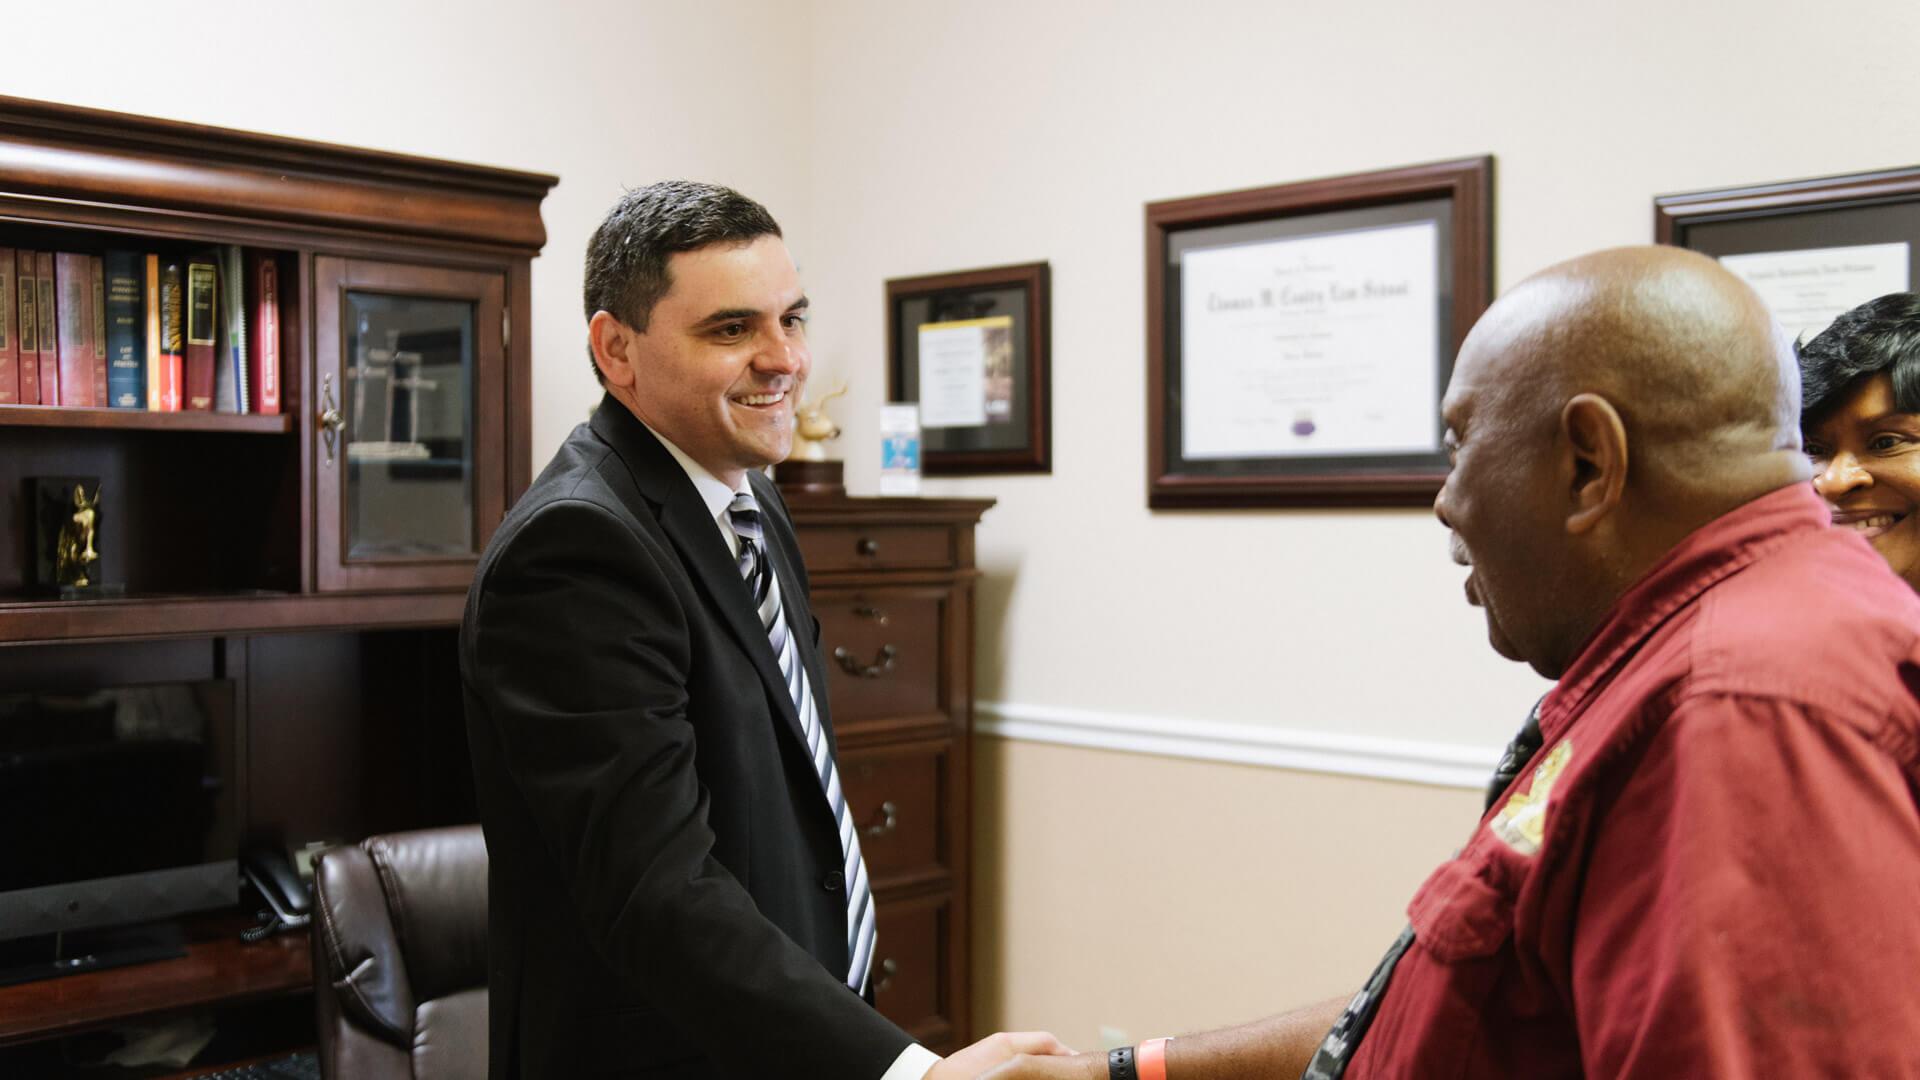 Chris Faucheux shaking hands with client